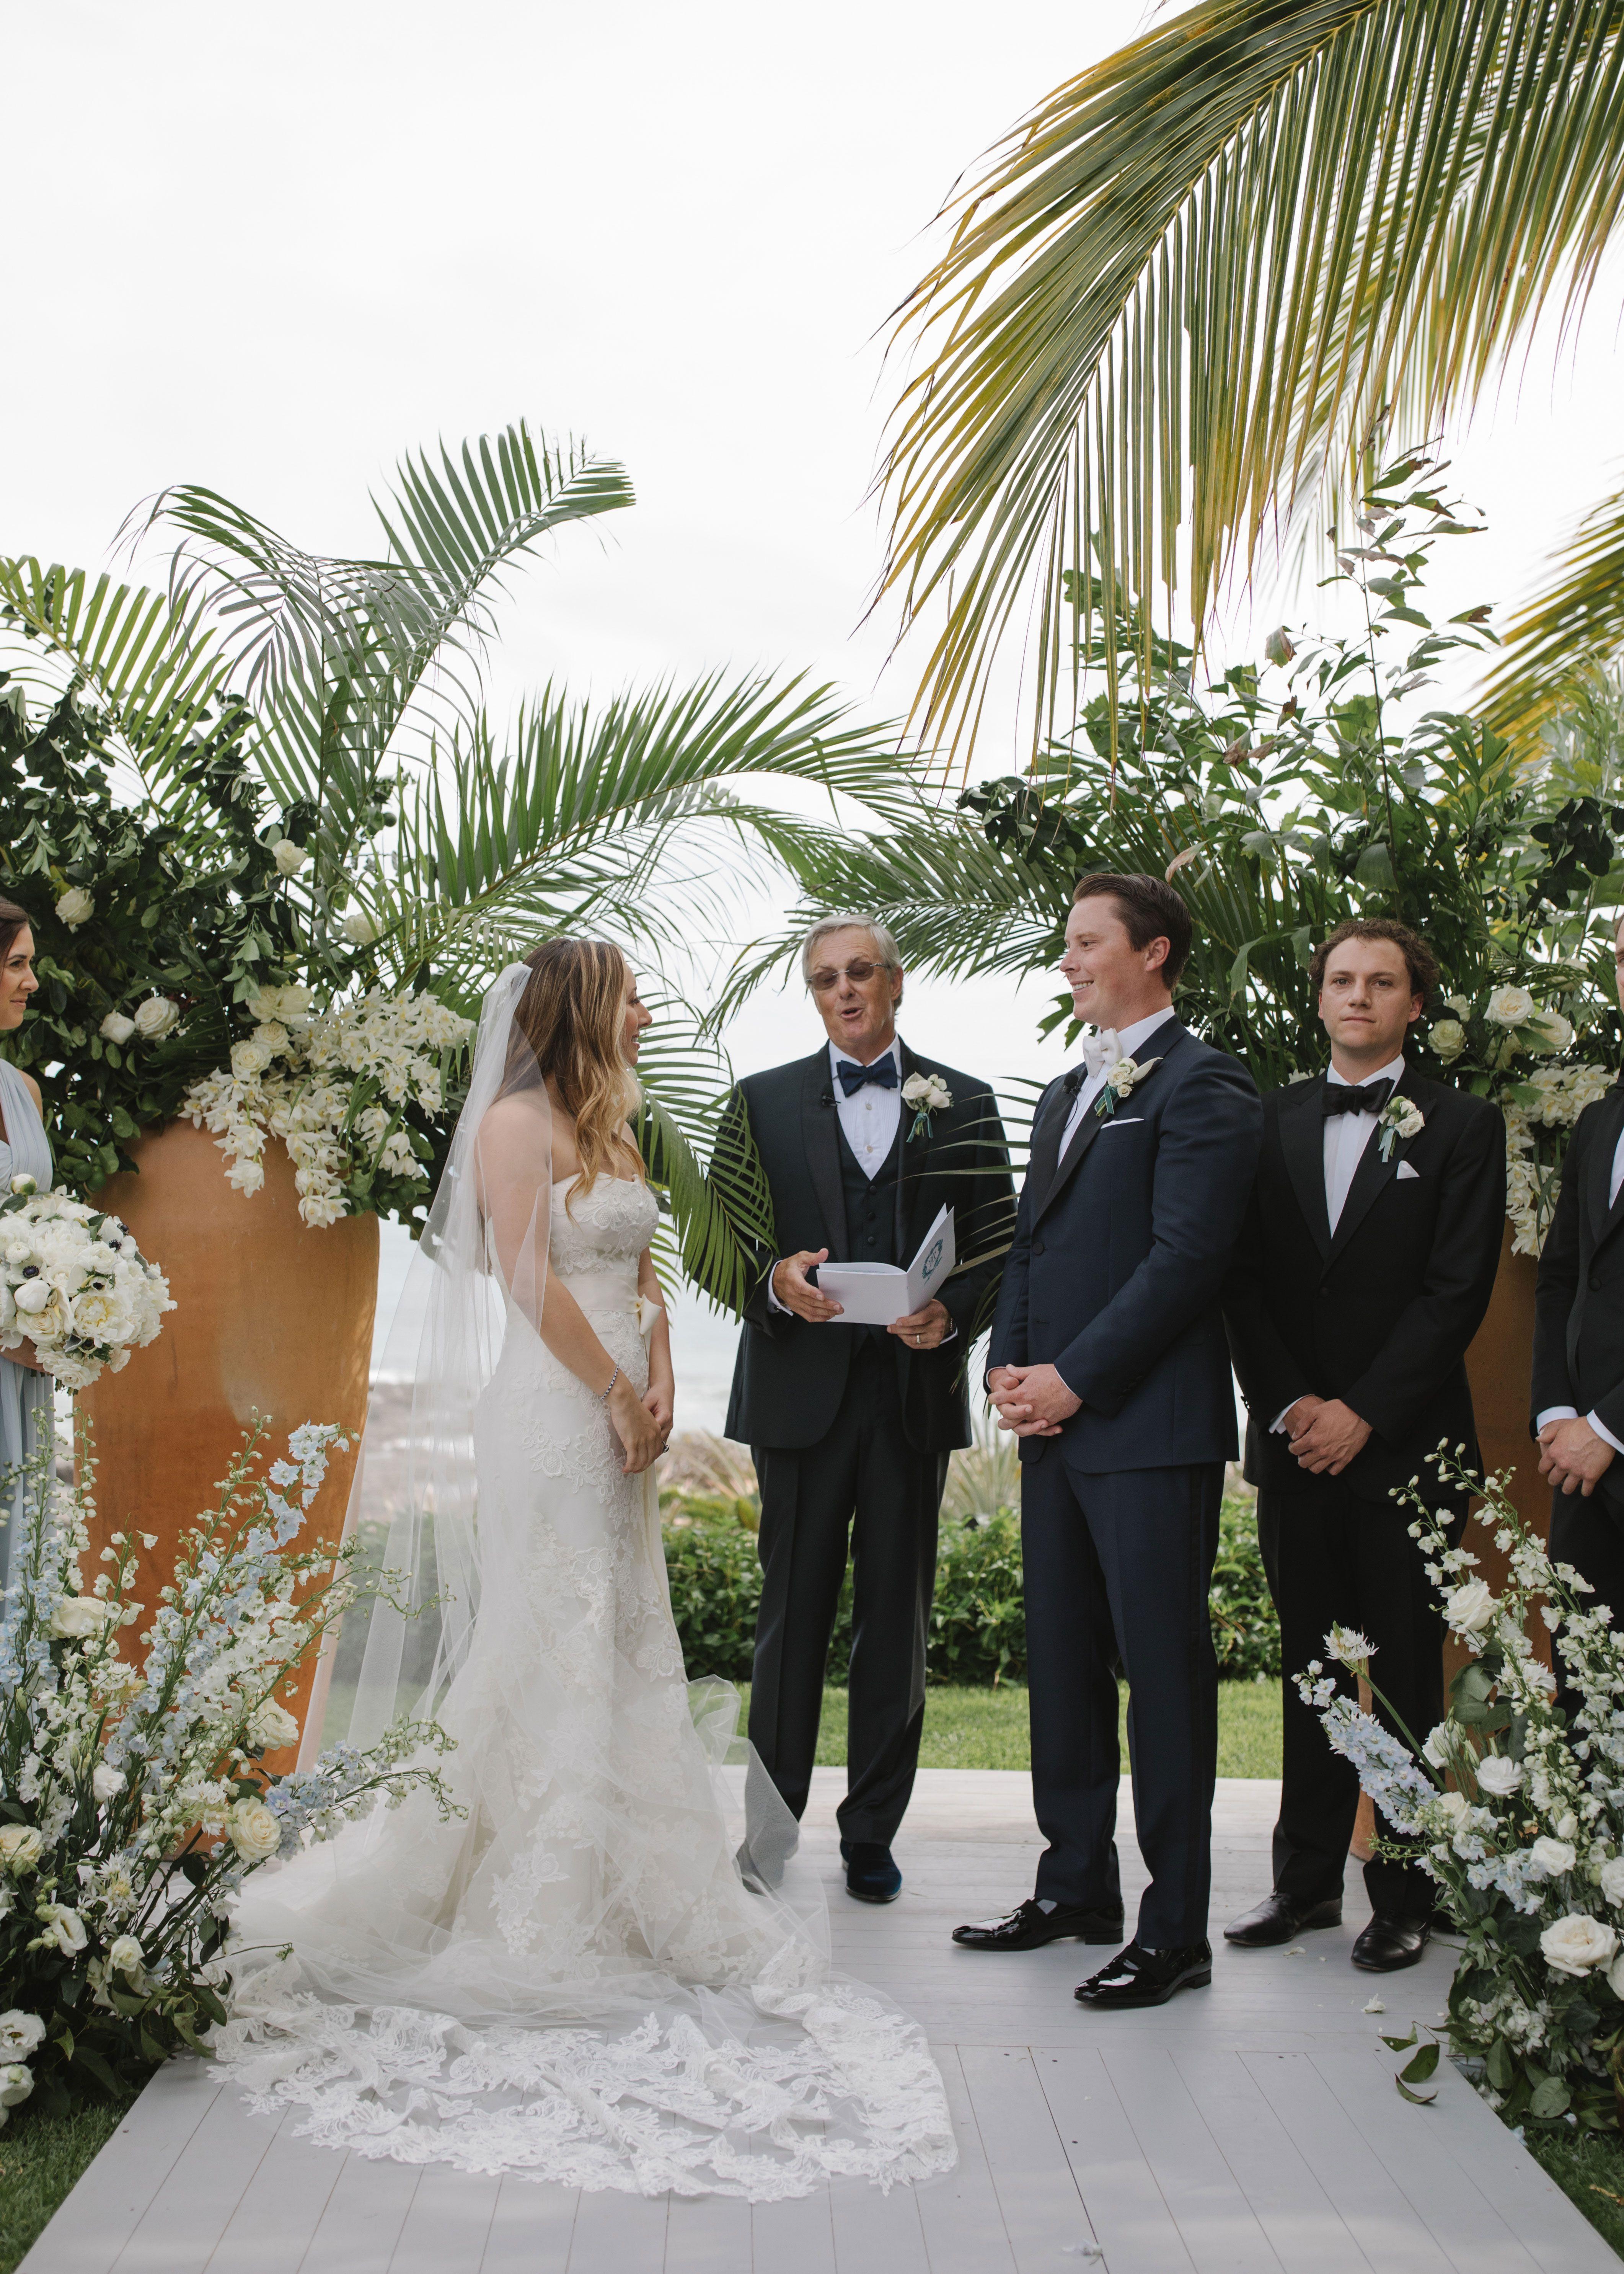 An Elegant Beach Wedding At Home In Punta Mita Mexico